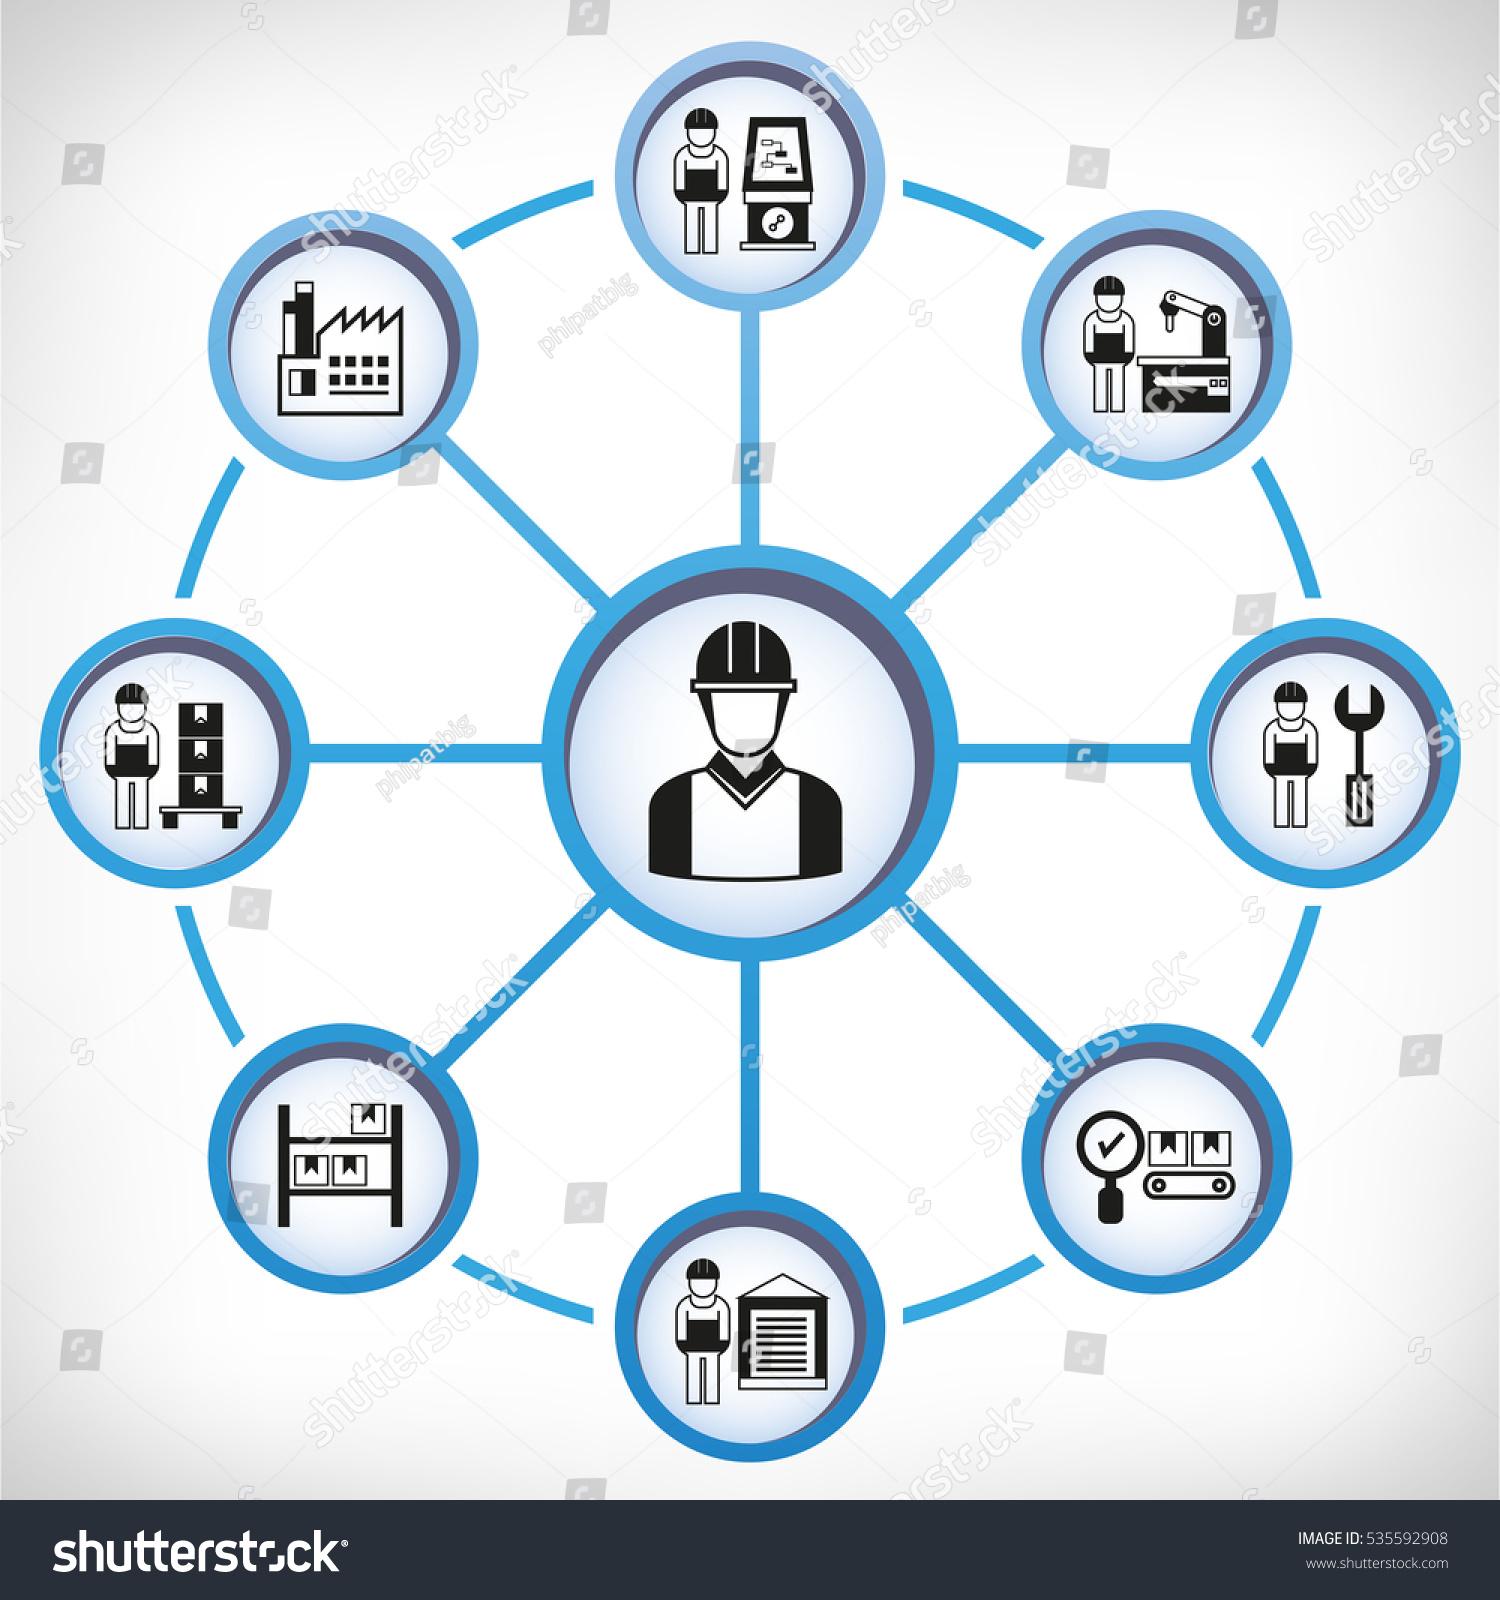 Engineering manufacturing icons circle diagram stock vector engineering and manufacturing icons in circle diagram ccuart Choice Image